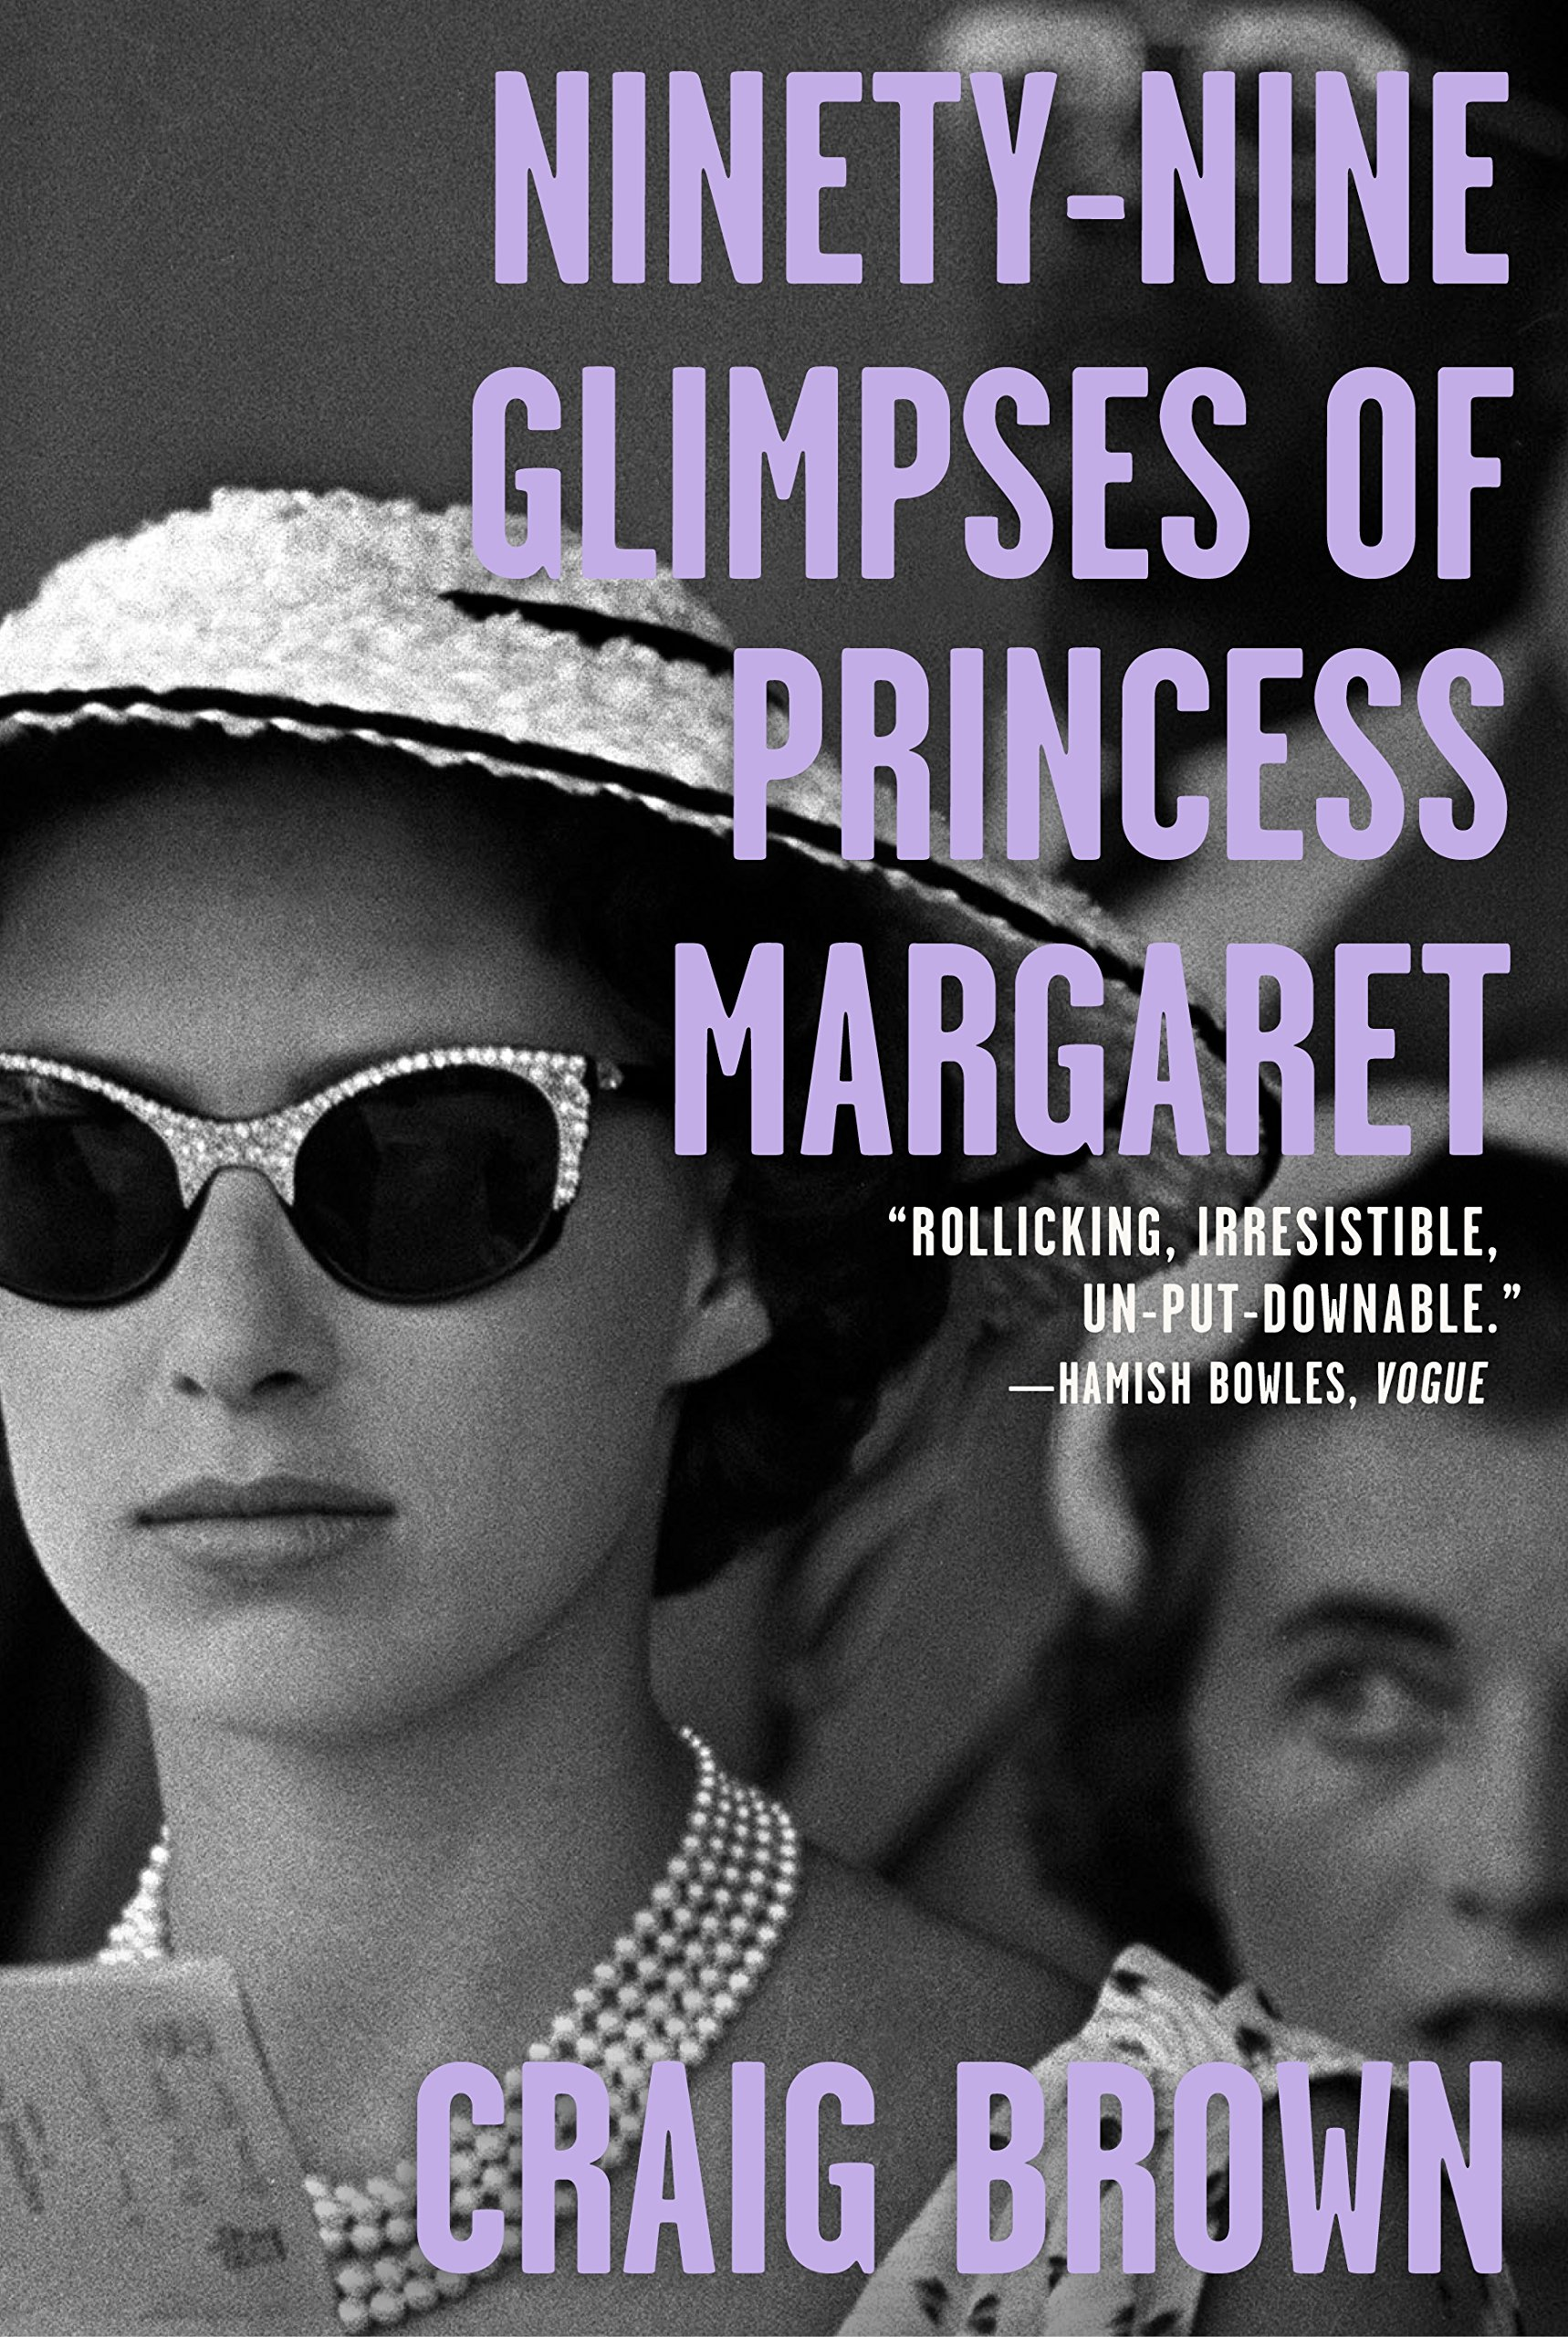 4f3fa48d3c361 Ninety-Nine Glimpses of Princess Margaret: Craig Brown ...